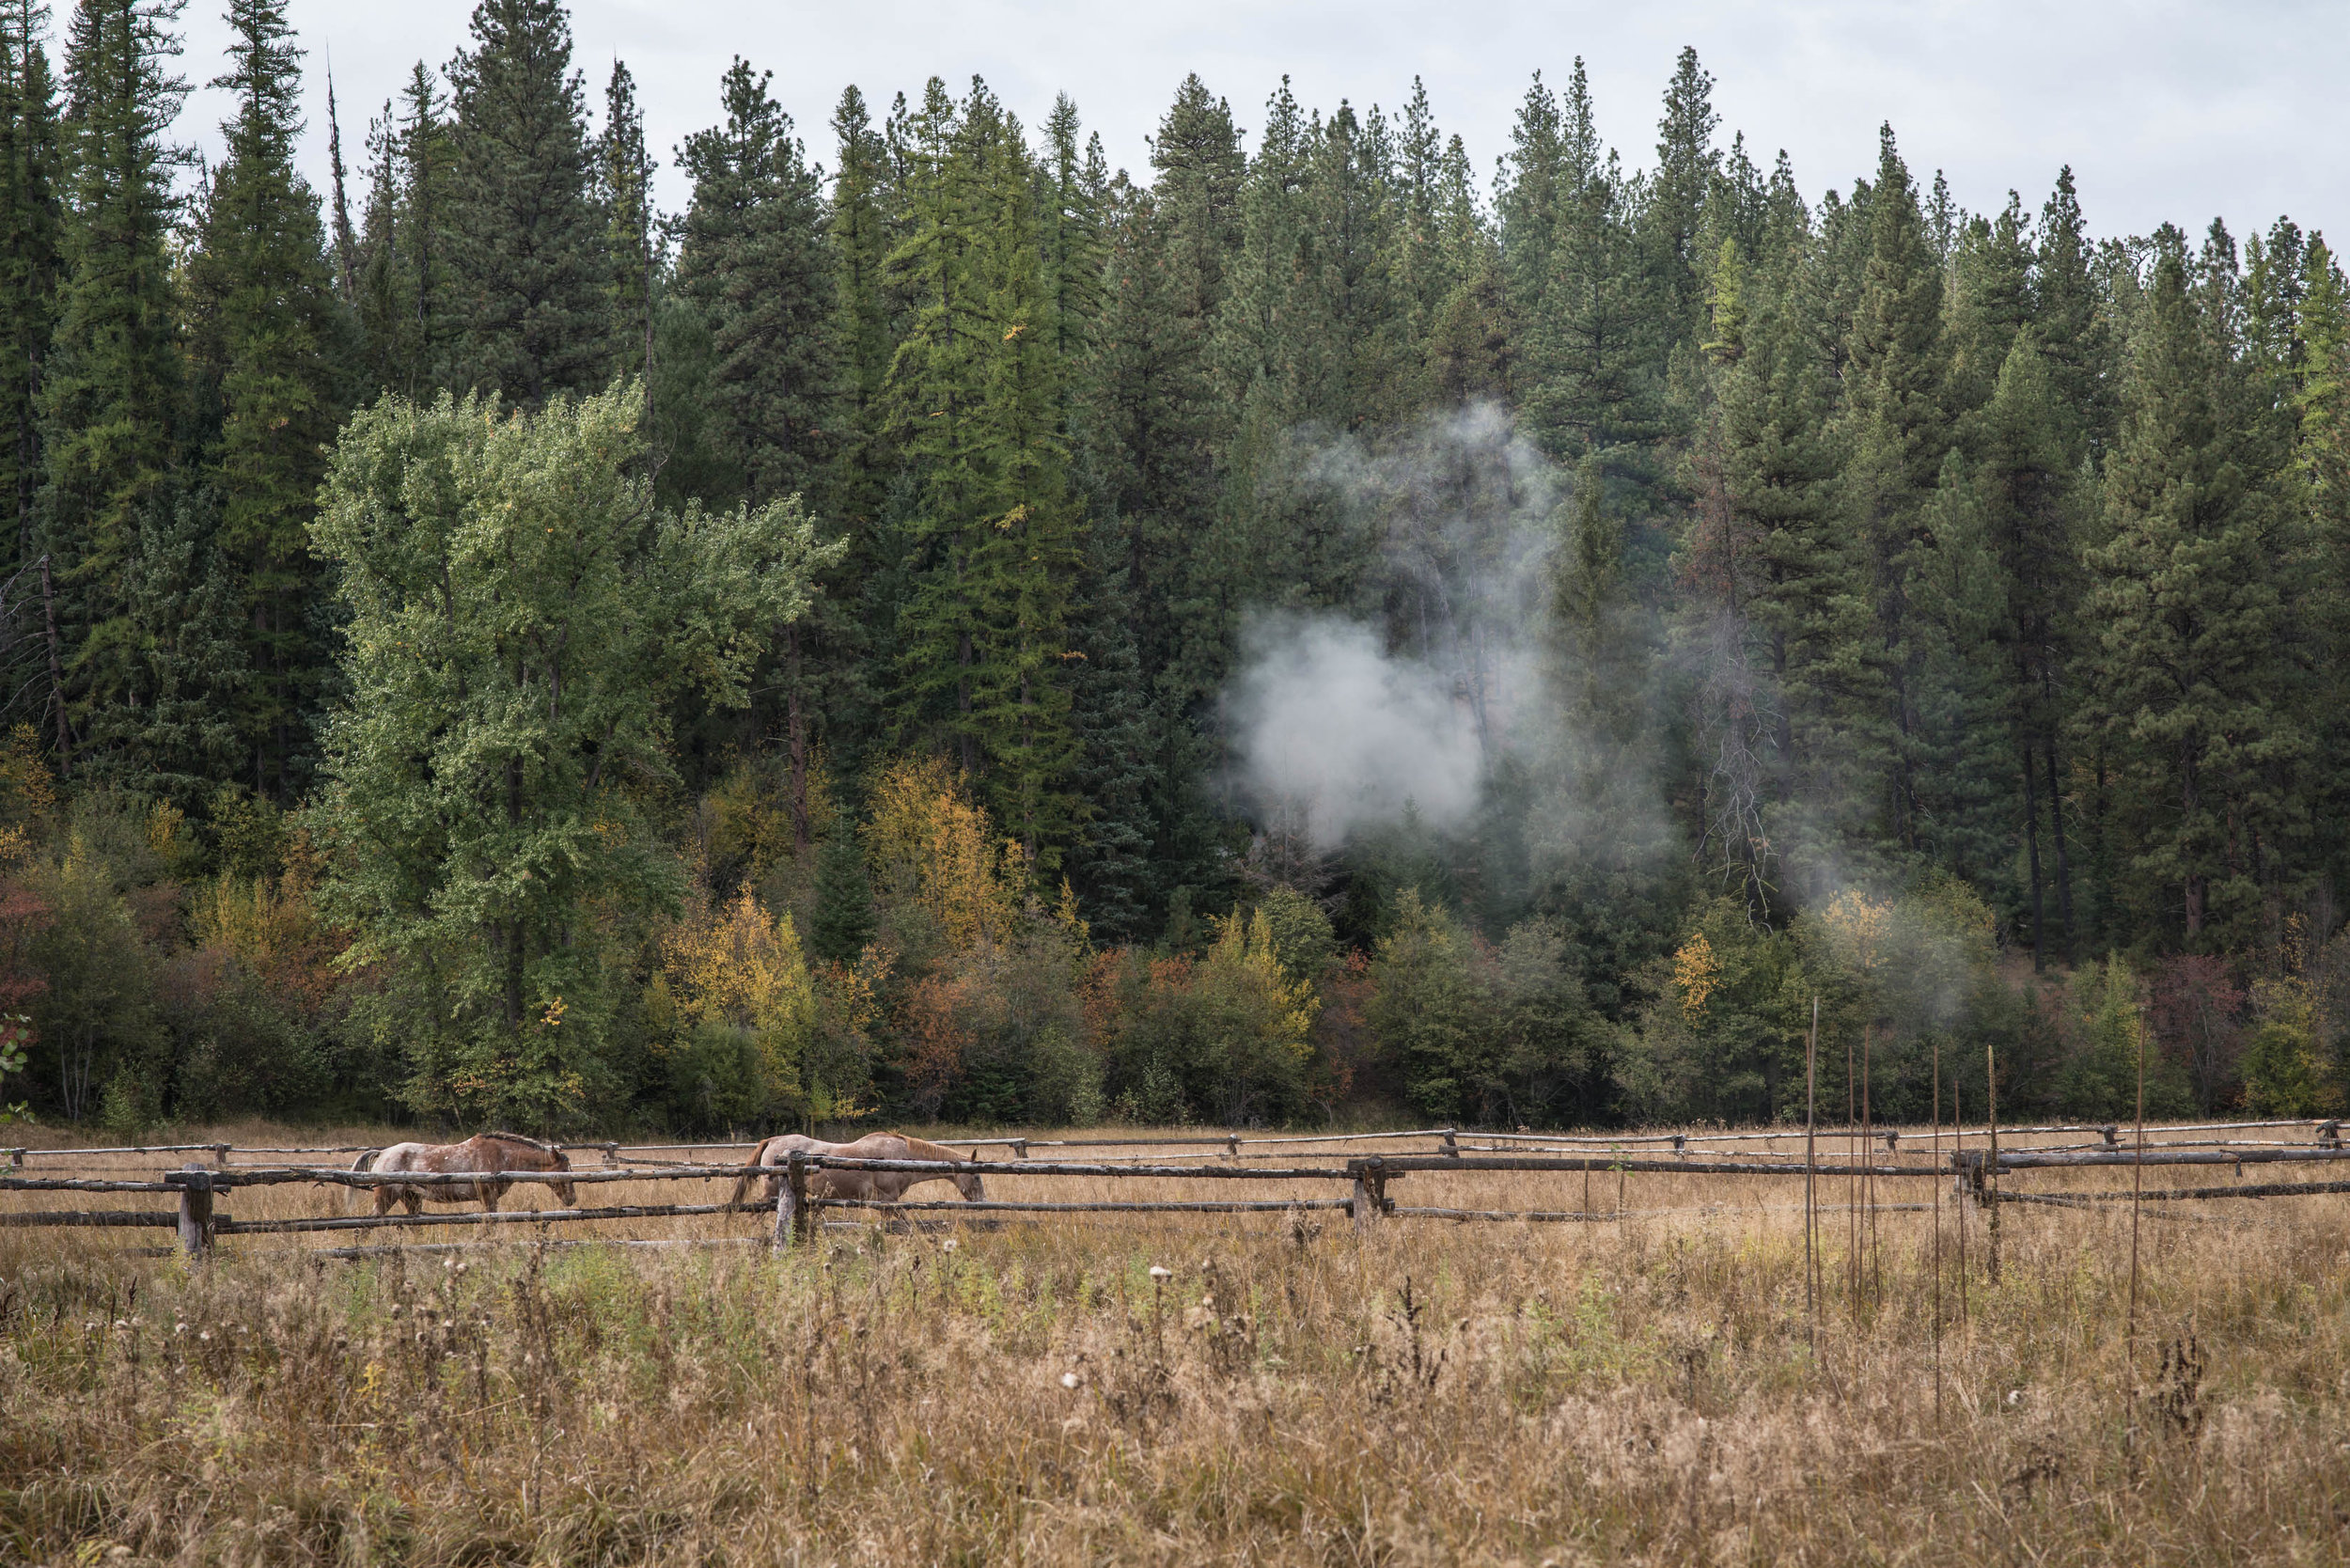 Minam_River_Lodge_Wallowa_Mountains_Eagle_Cap_Wilderness_Oregon_Autumn_2017_Please_Credit_Talia_Jean_Galvin-156.jpg